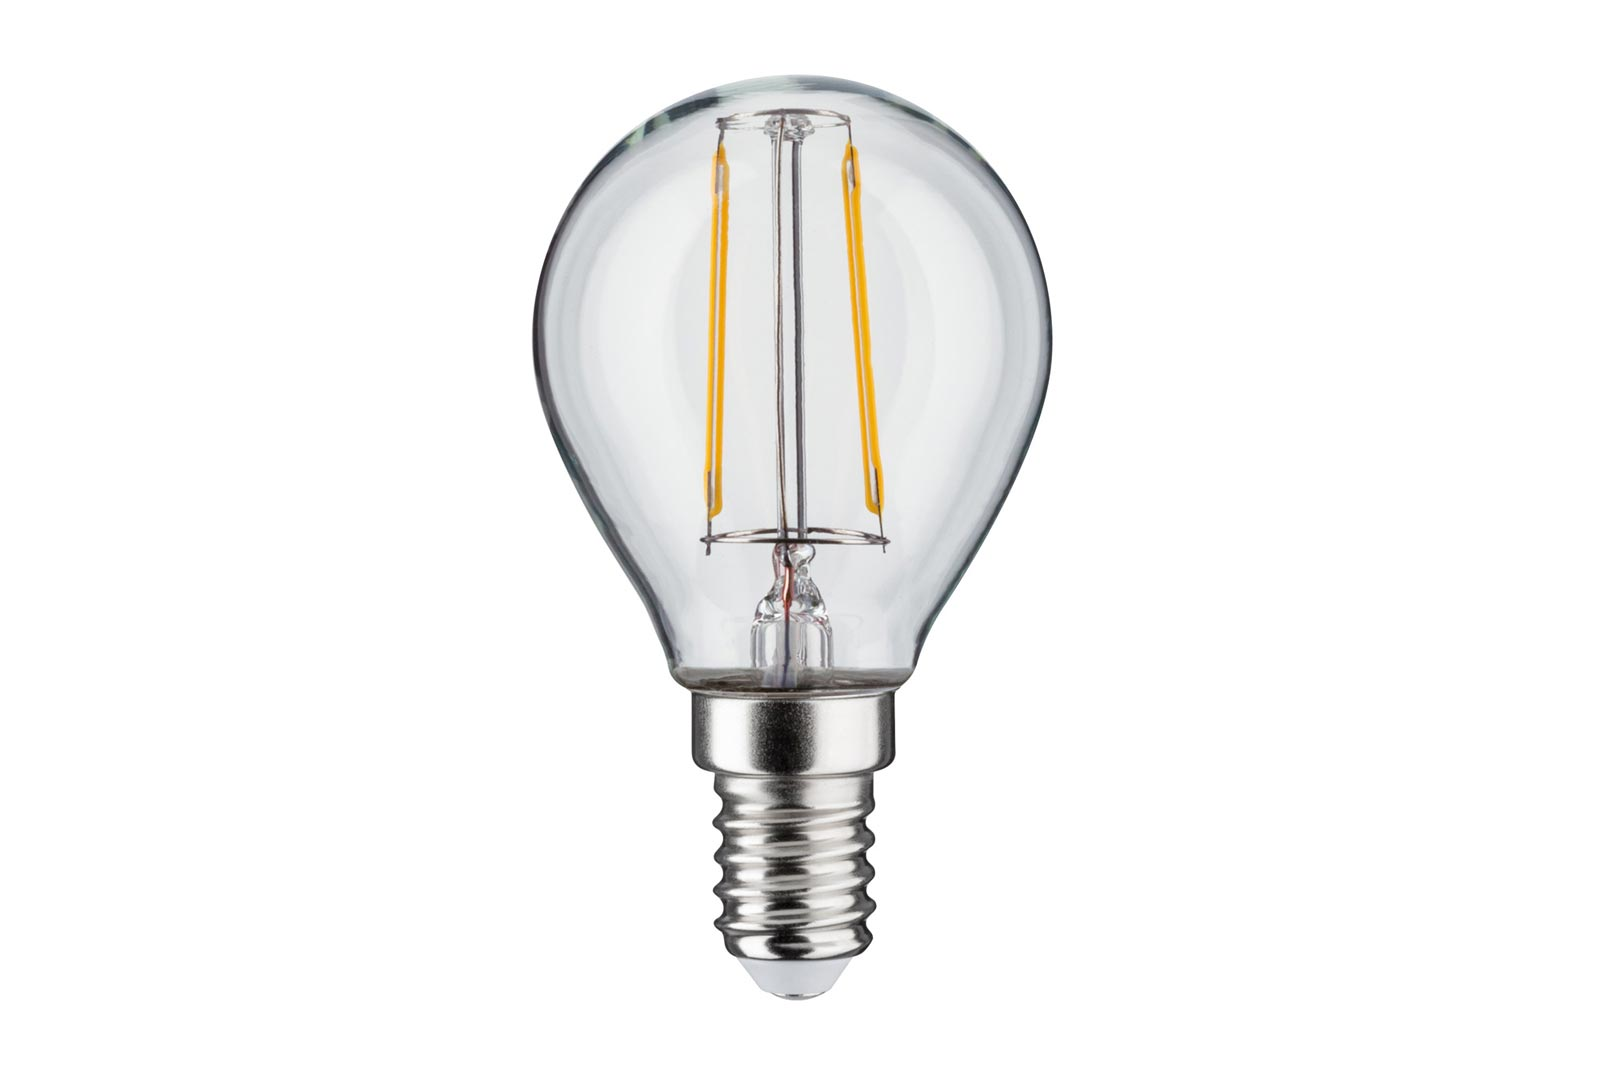 PAULMANN P 28476 led žárovka 2W 2W > 80 Ra